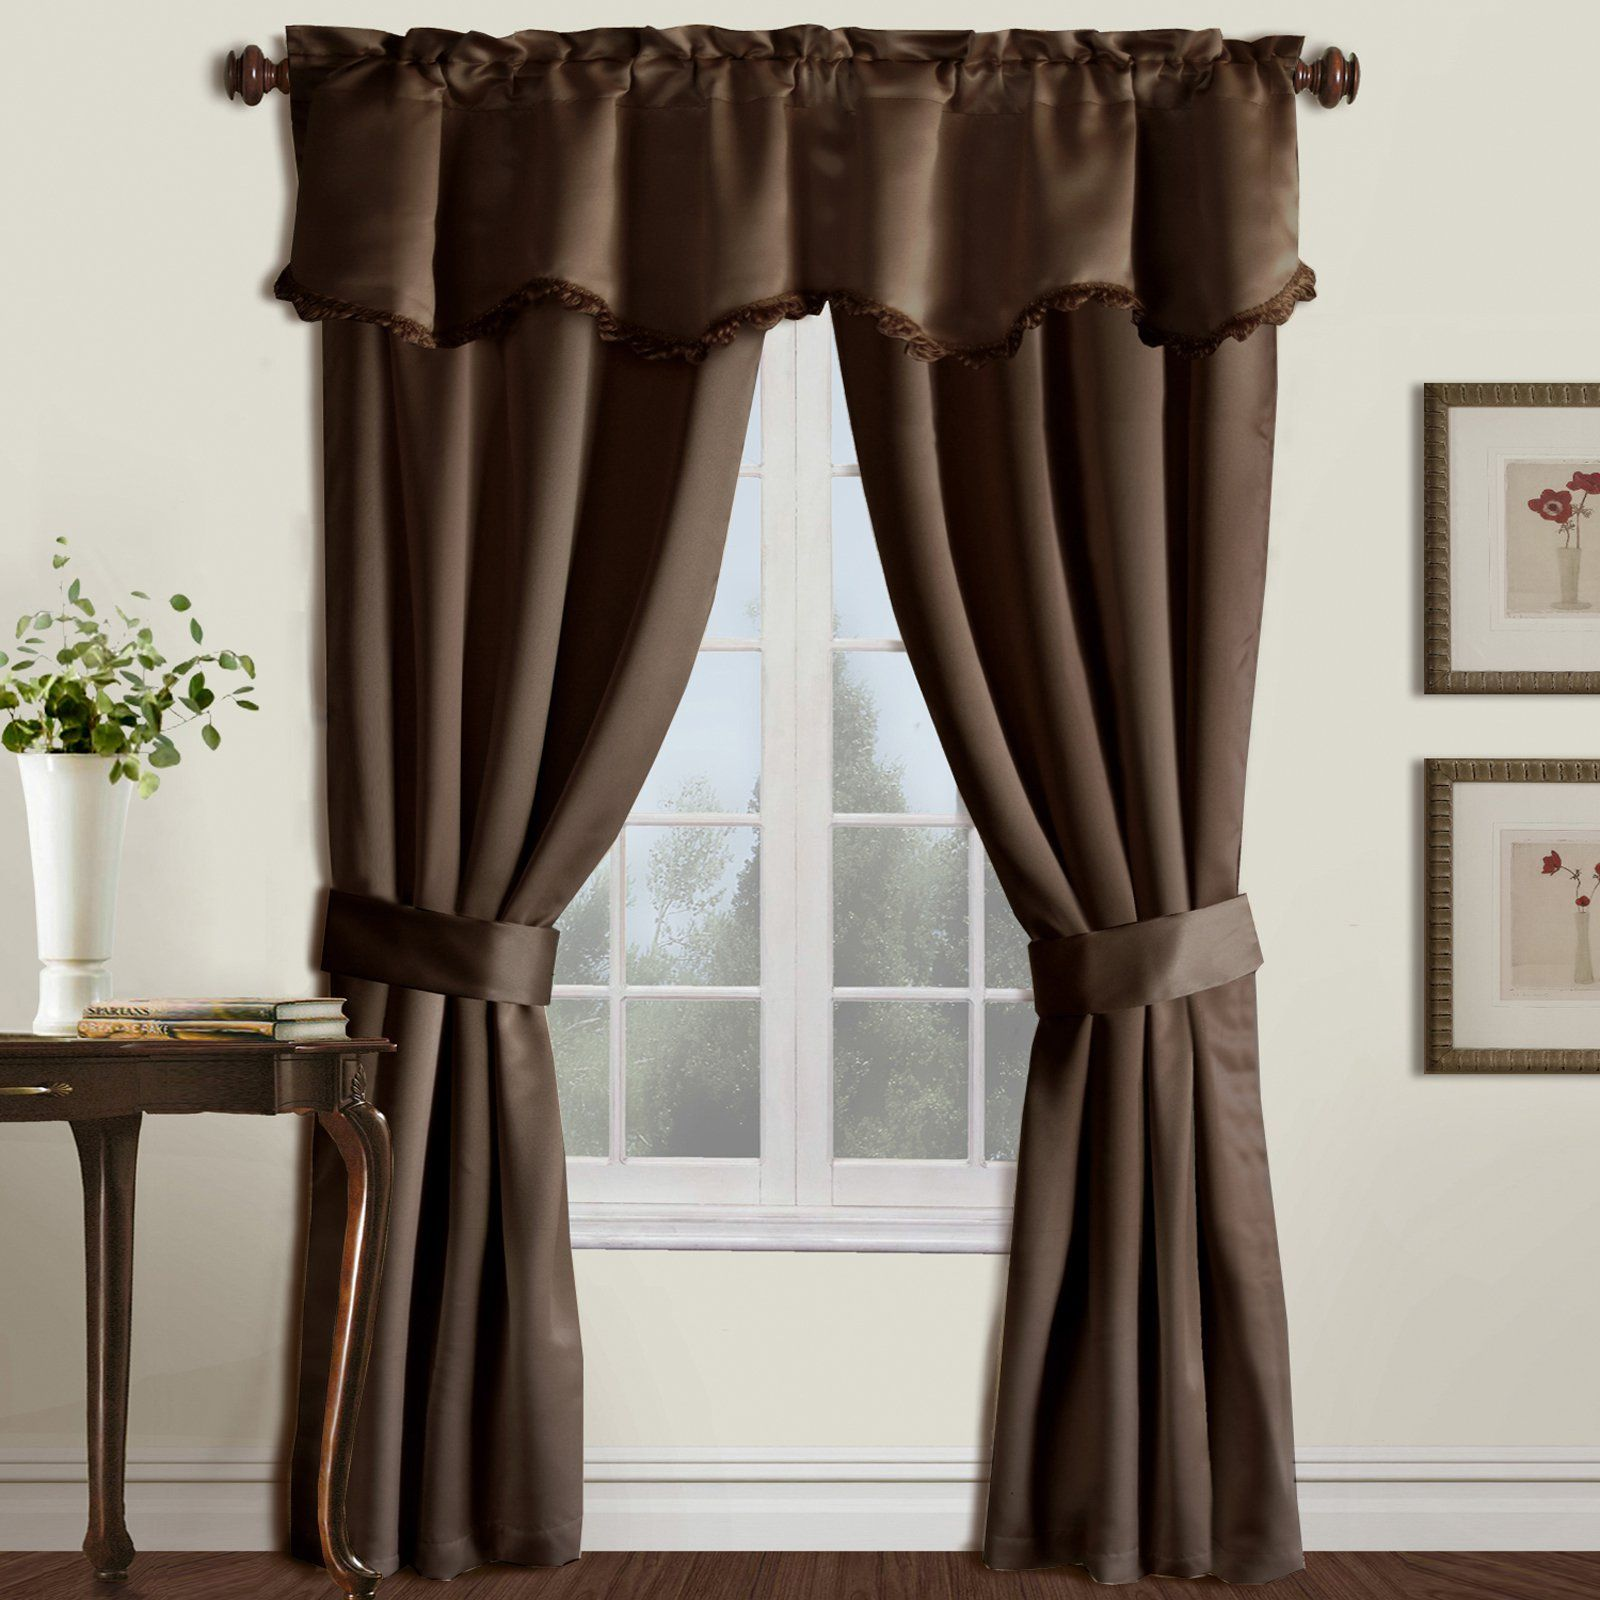 Living Room Curtain Sets Curtains Rod Pocket Curtains Curtains